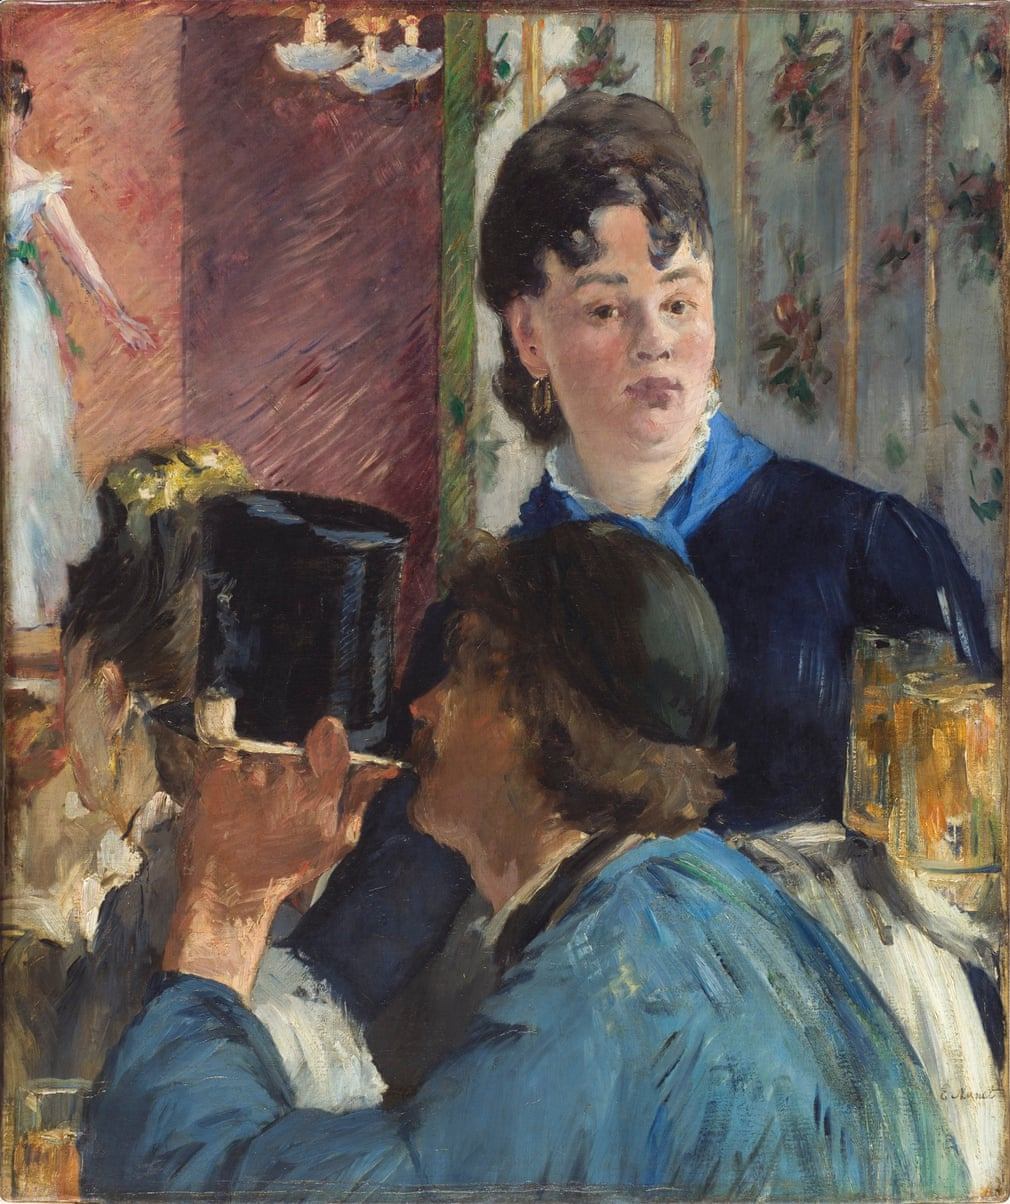 Edouard Manet: La Serveuse de bocks, 1878-1879